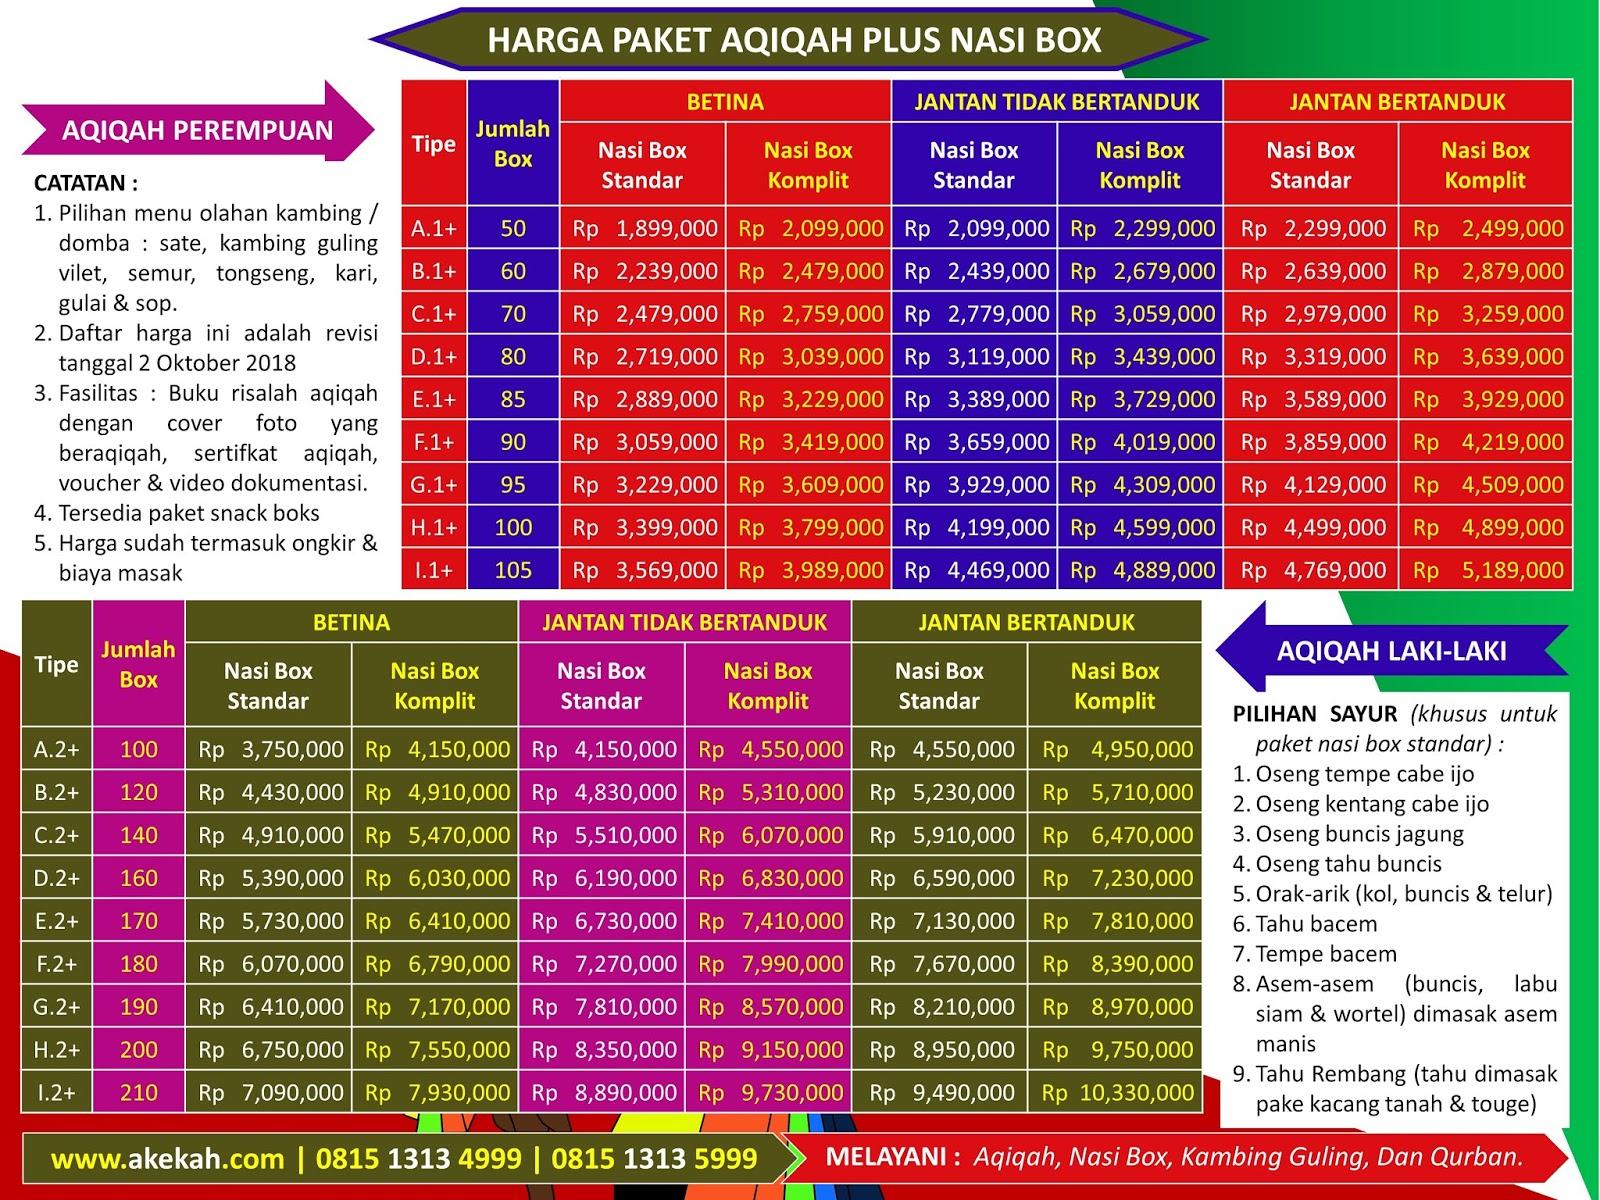 Jasa Aqiqah & Catering Untuk Anak Daerah Gunung Putri Kabupaten Bogor Jawa Barat